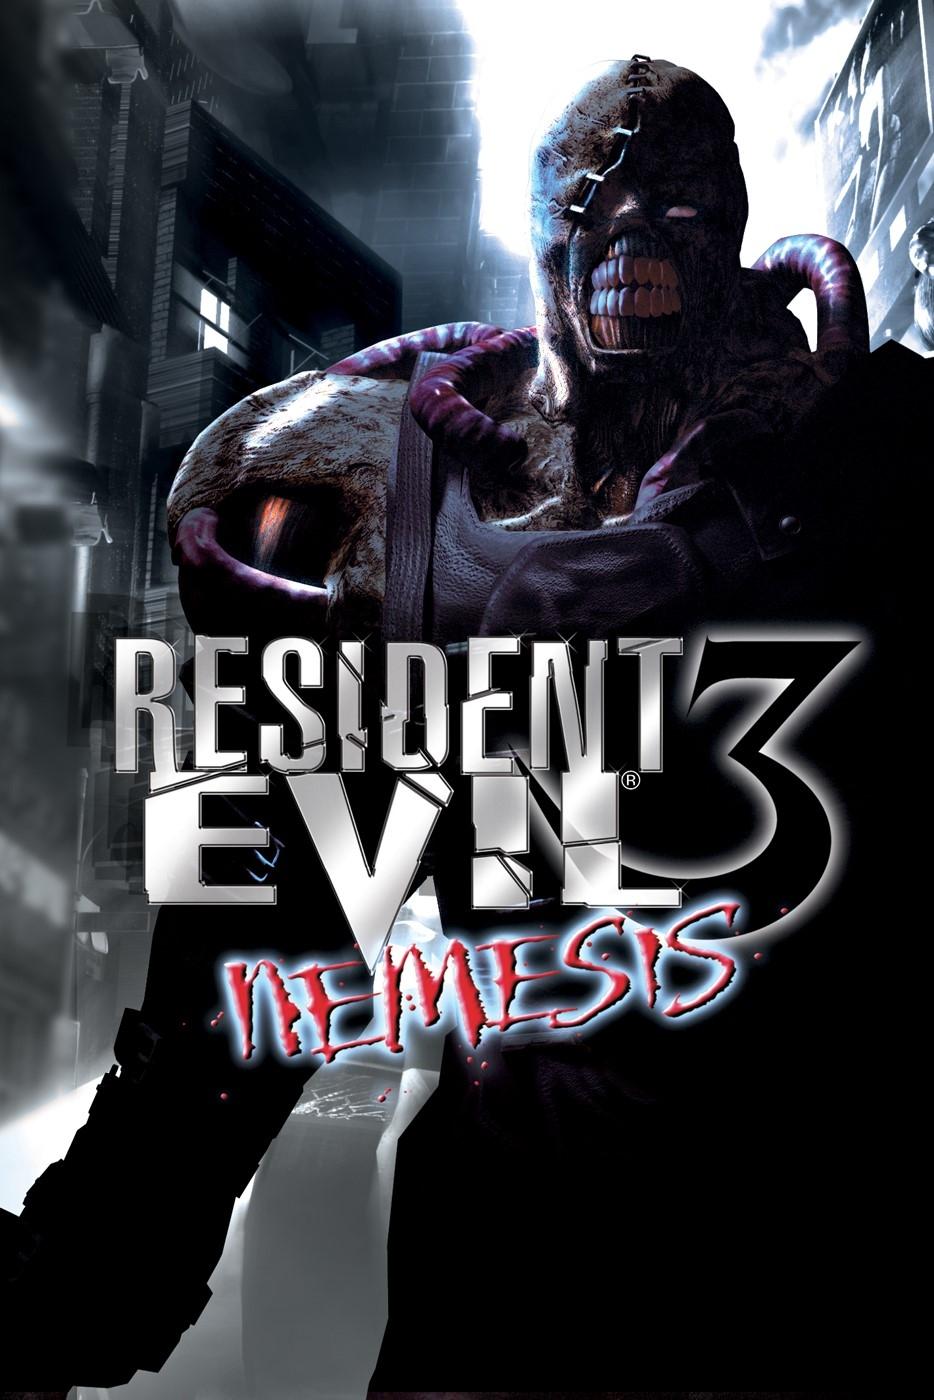 Resident Evil 3 Nemesis Details LaunchBox Games Database